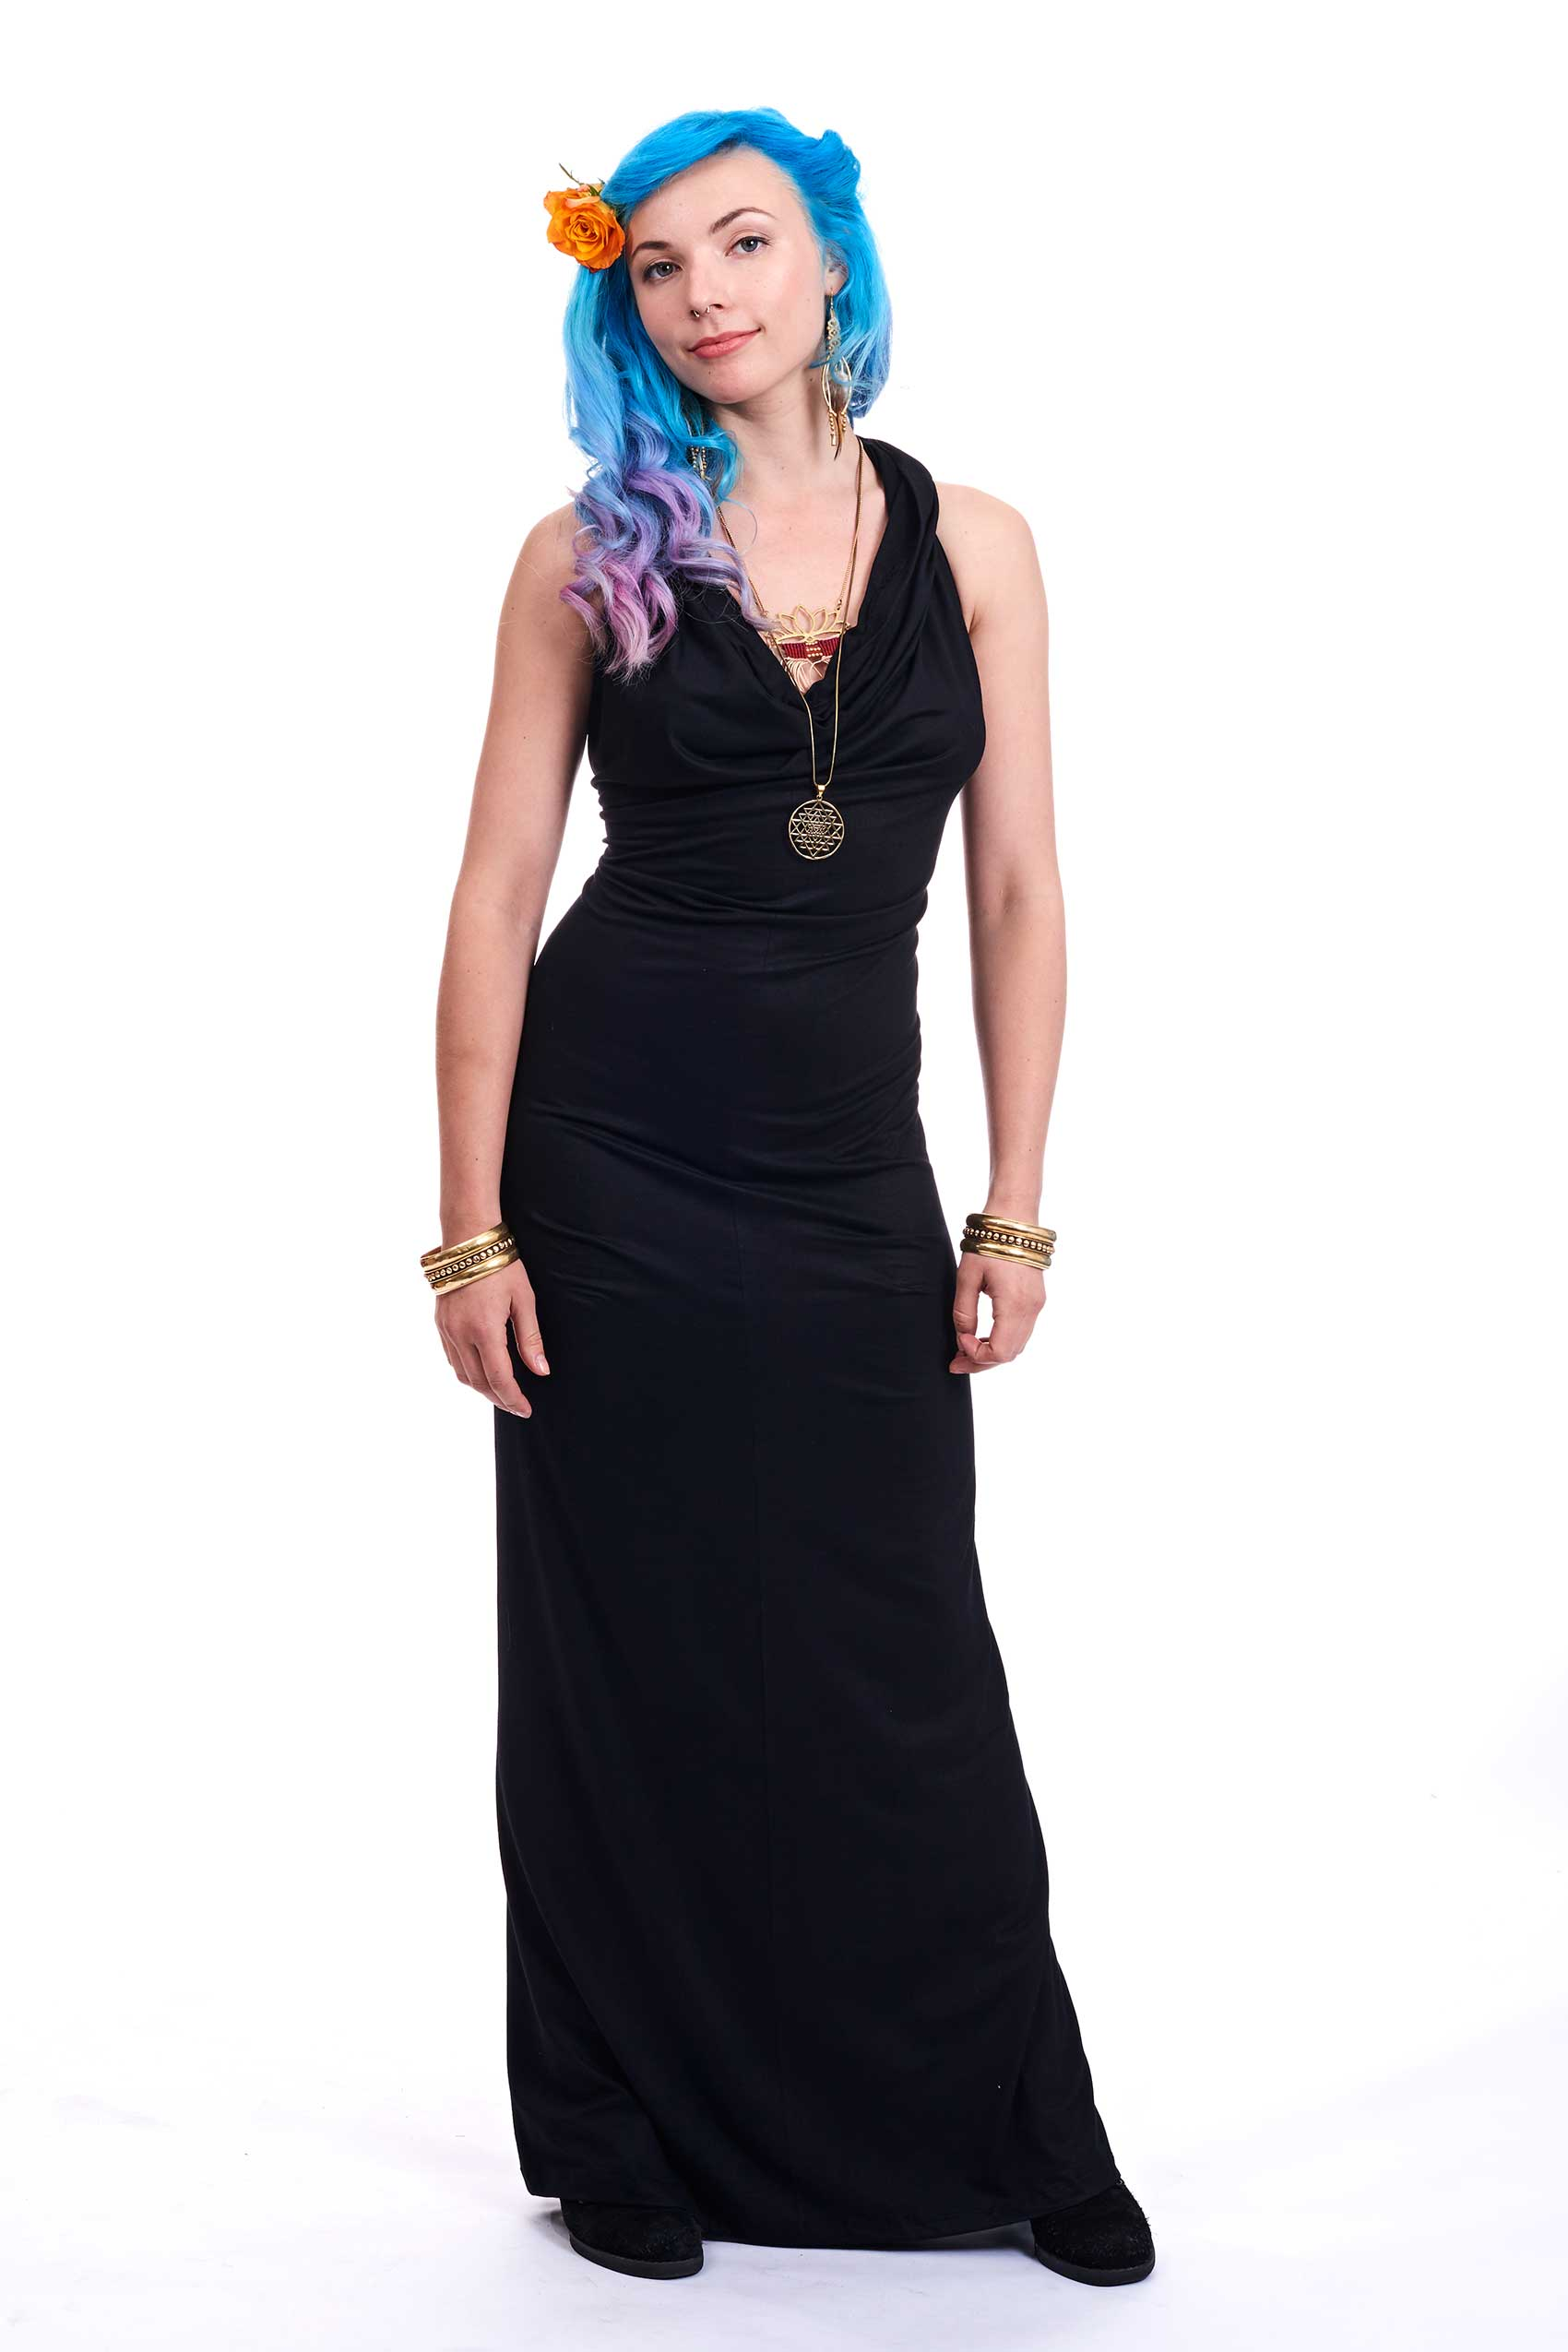 Slinky Cowl Neck Ball Gown, long evening dress | Altshop UK